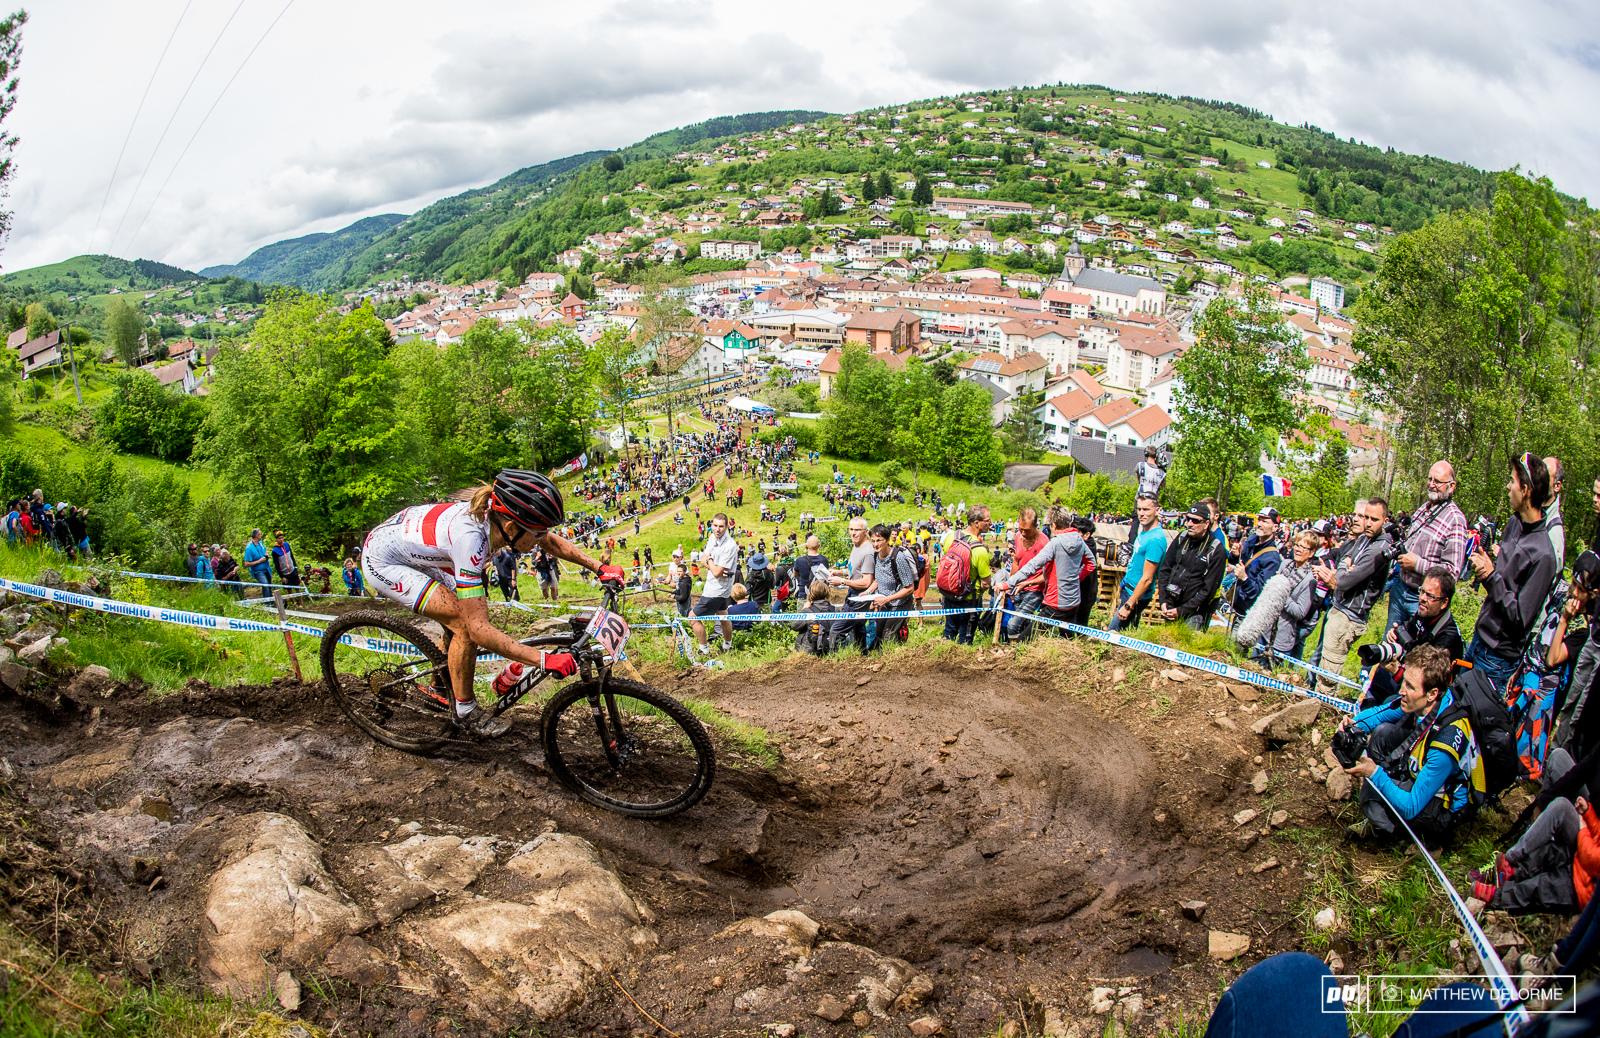 Maja Wlozsczowska traversing with La Bresse below. She rode to fifth place today.